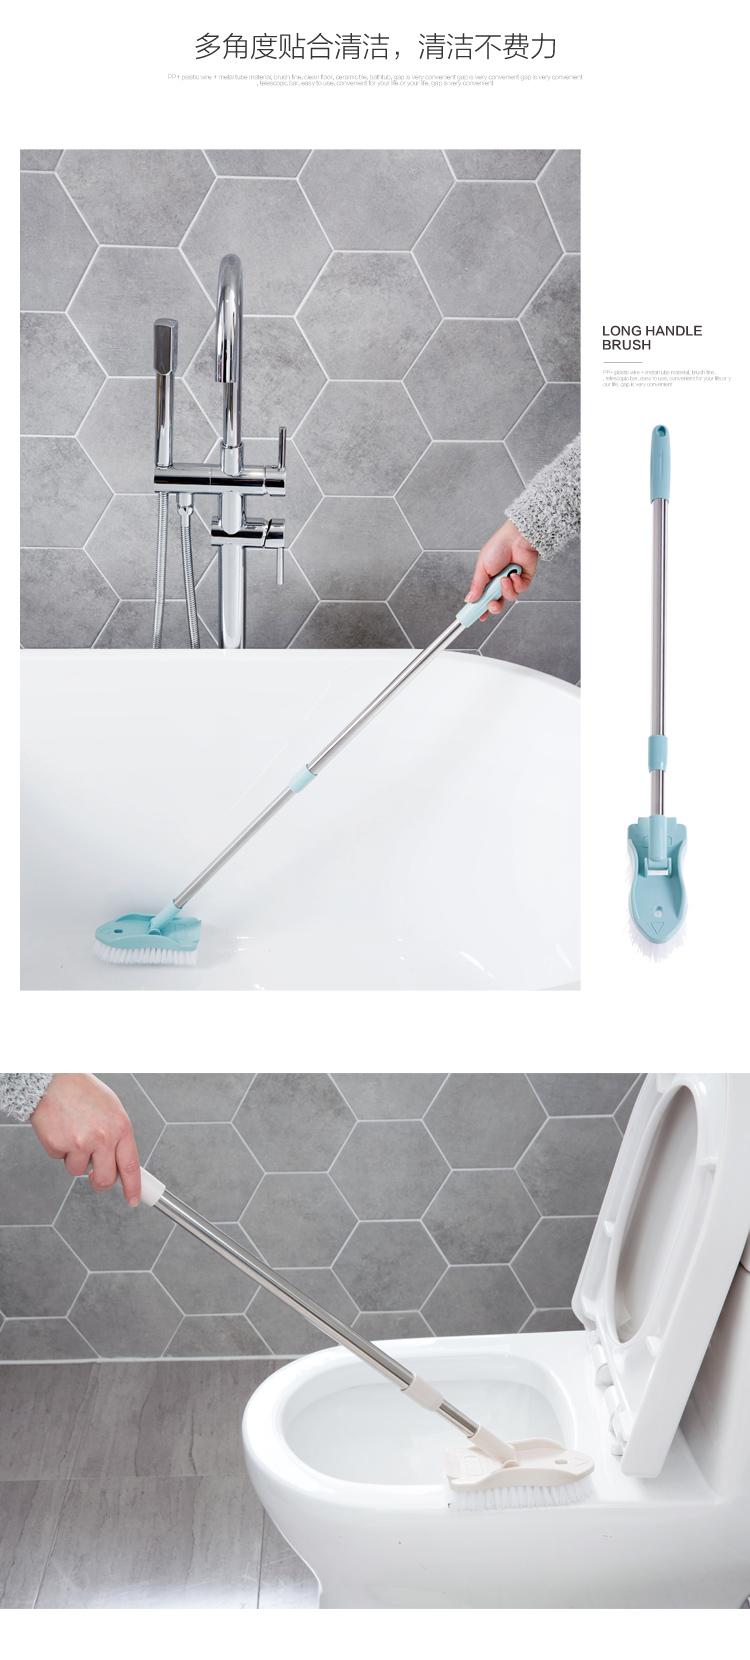 Retractable long handle cleaning brush bristle bathroom floor brush ...